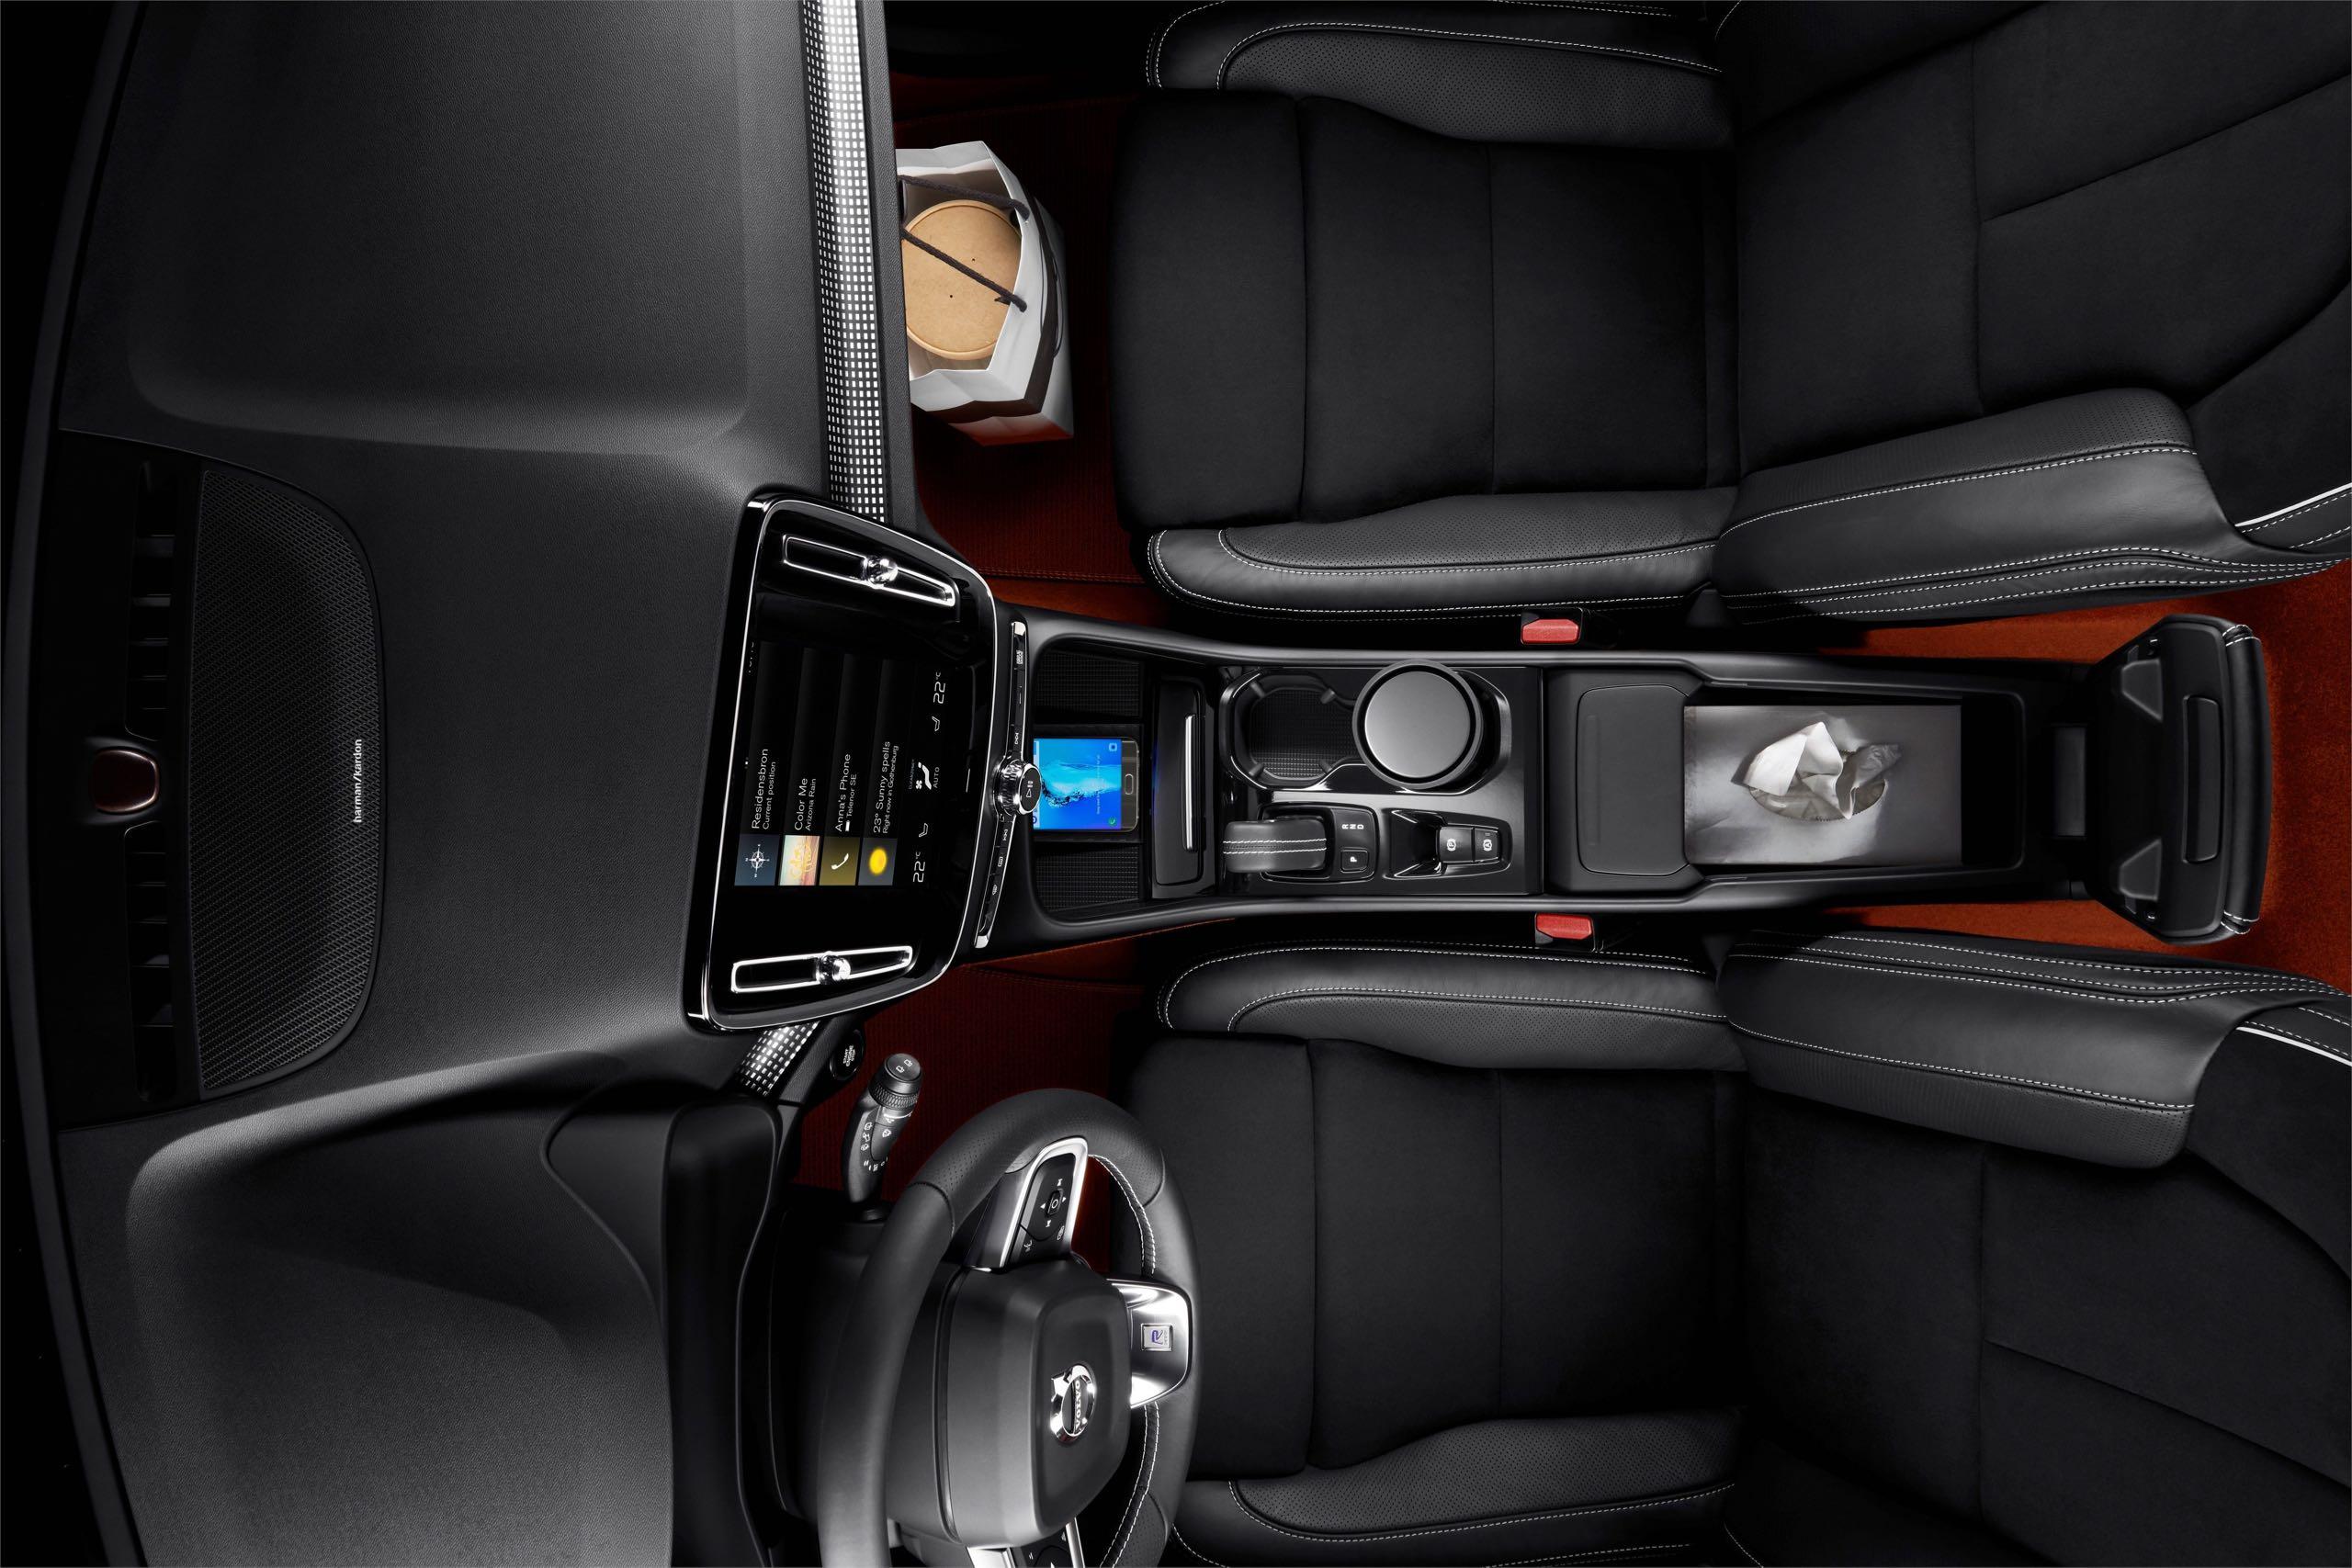 New Volvo XC40 Interior -  2017, 2018, 2018 New XC40, Interior, New XC40